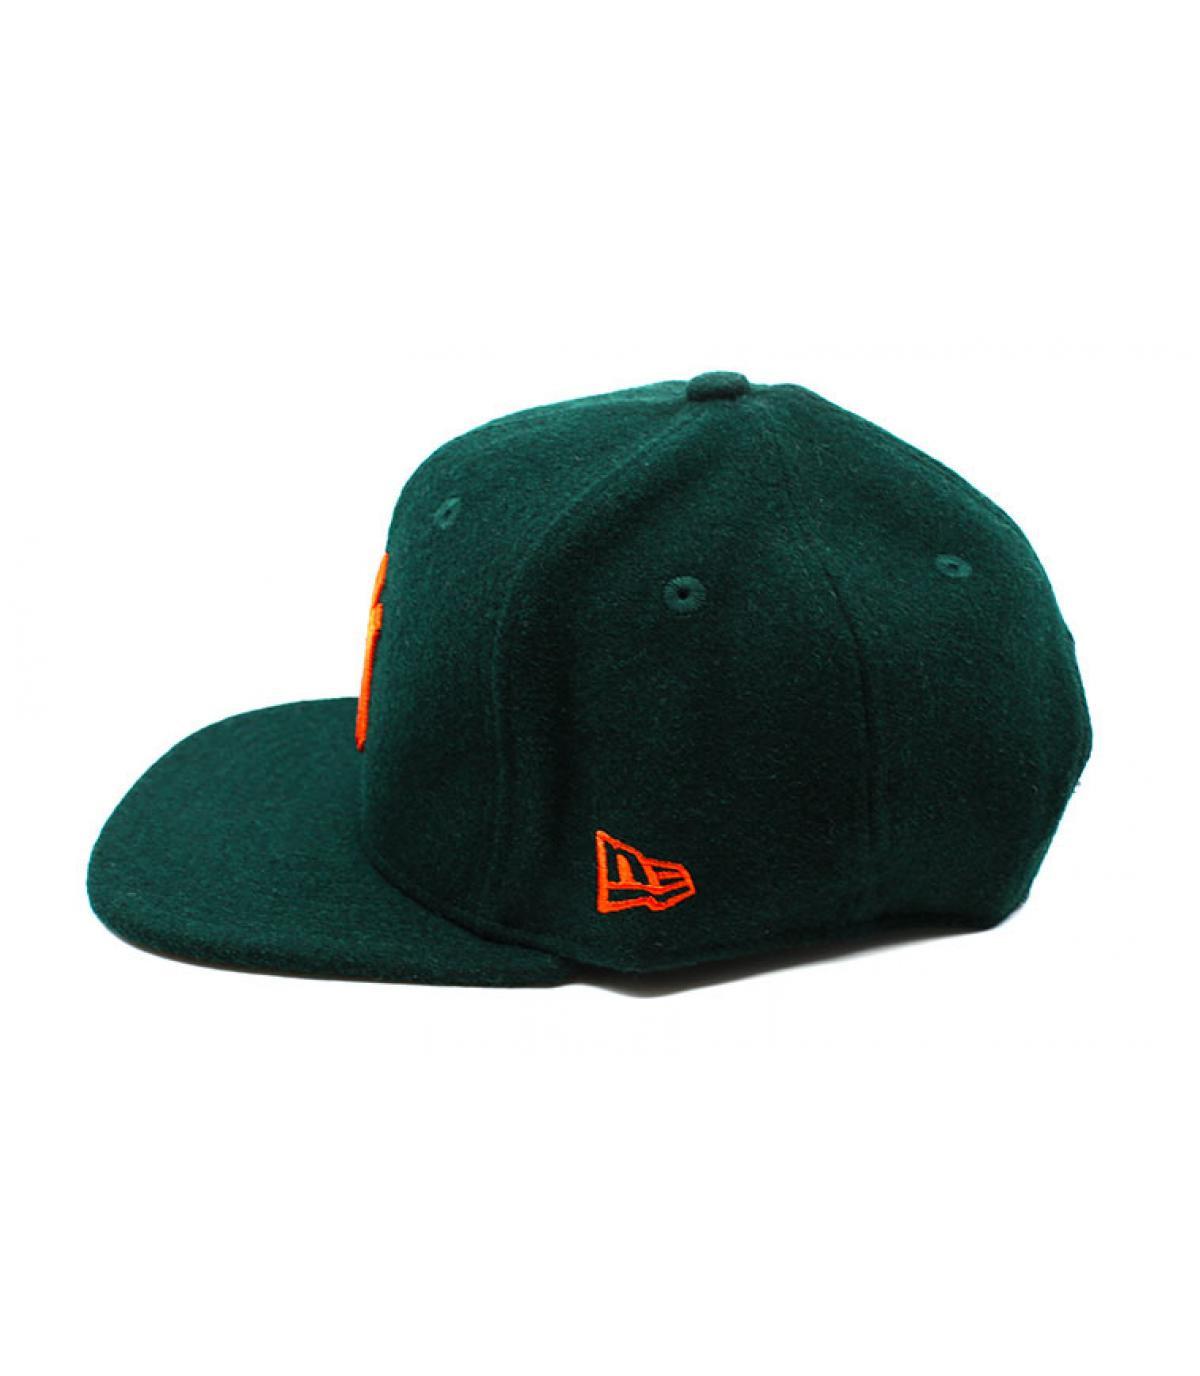 Détails Snapback Winter Utility NY Melton 9Fifty dark green orange - image 4